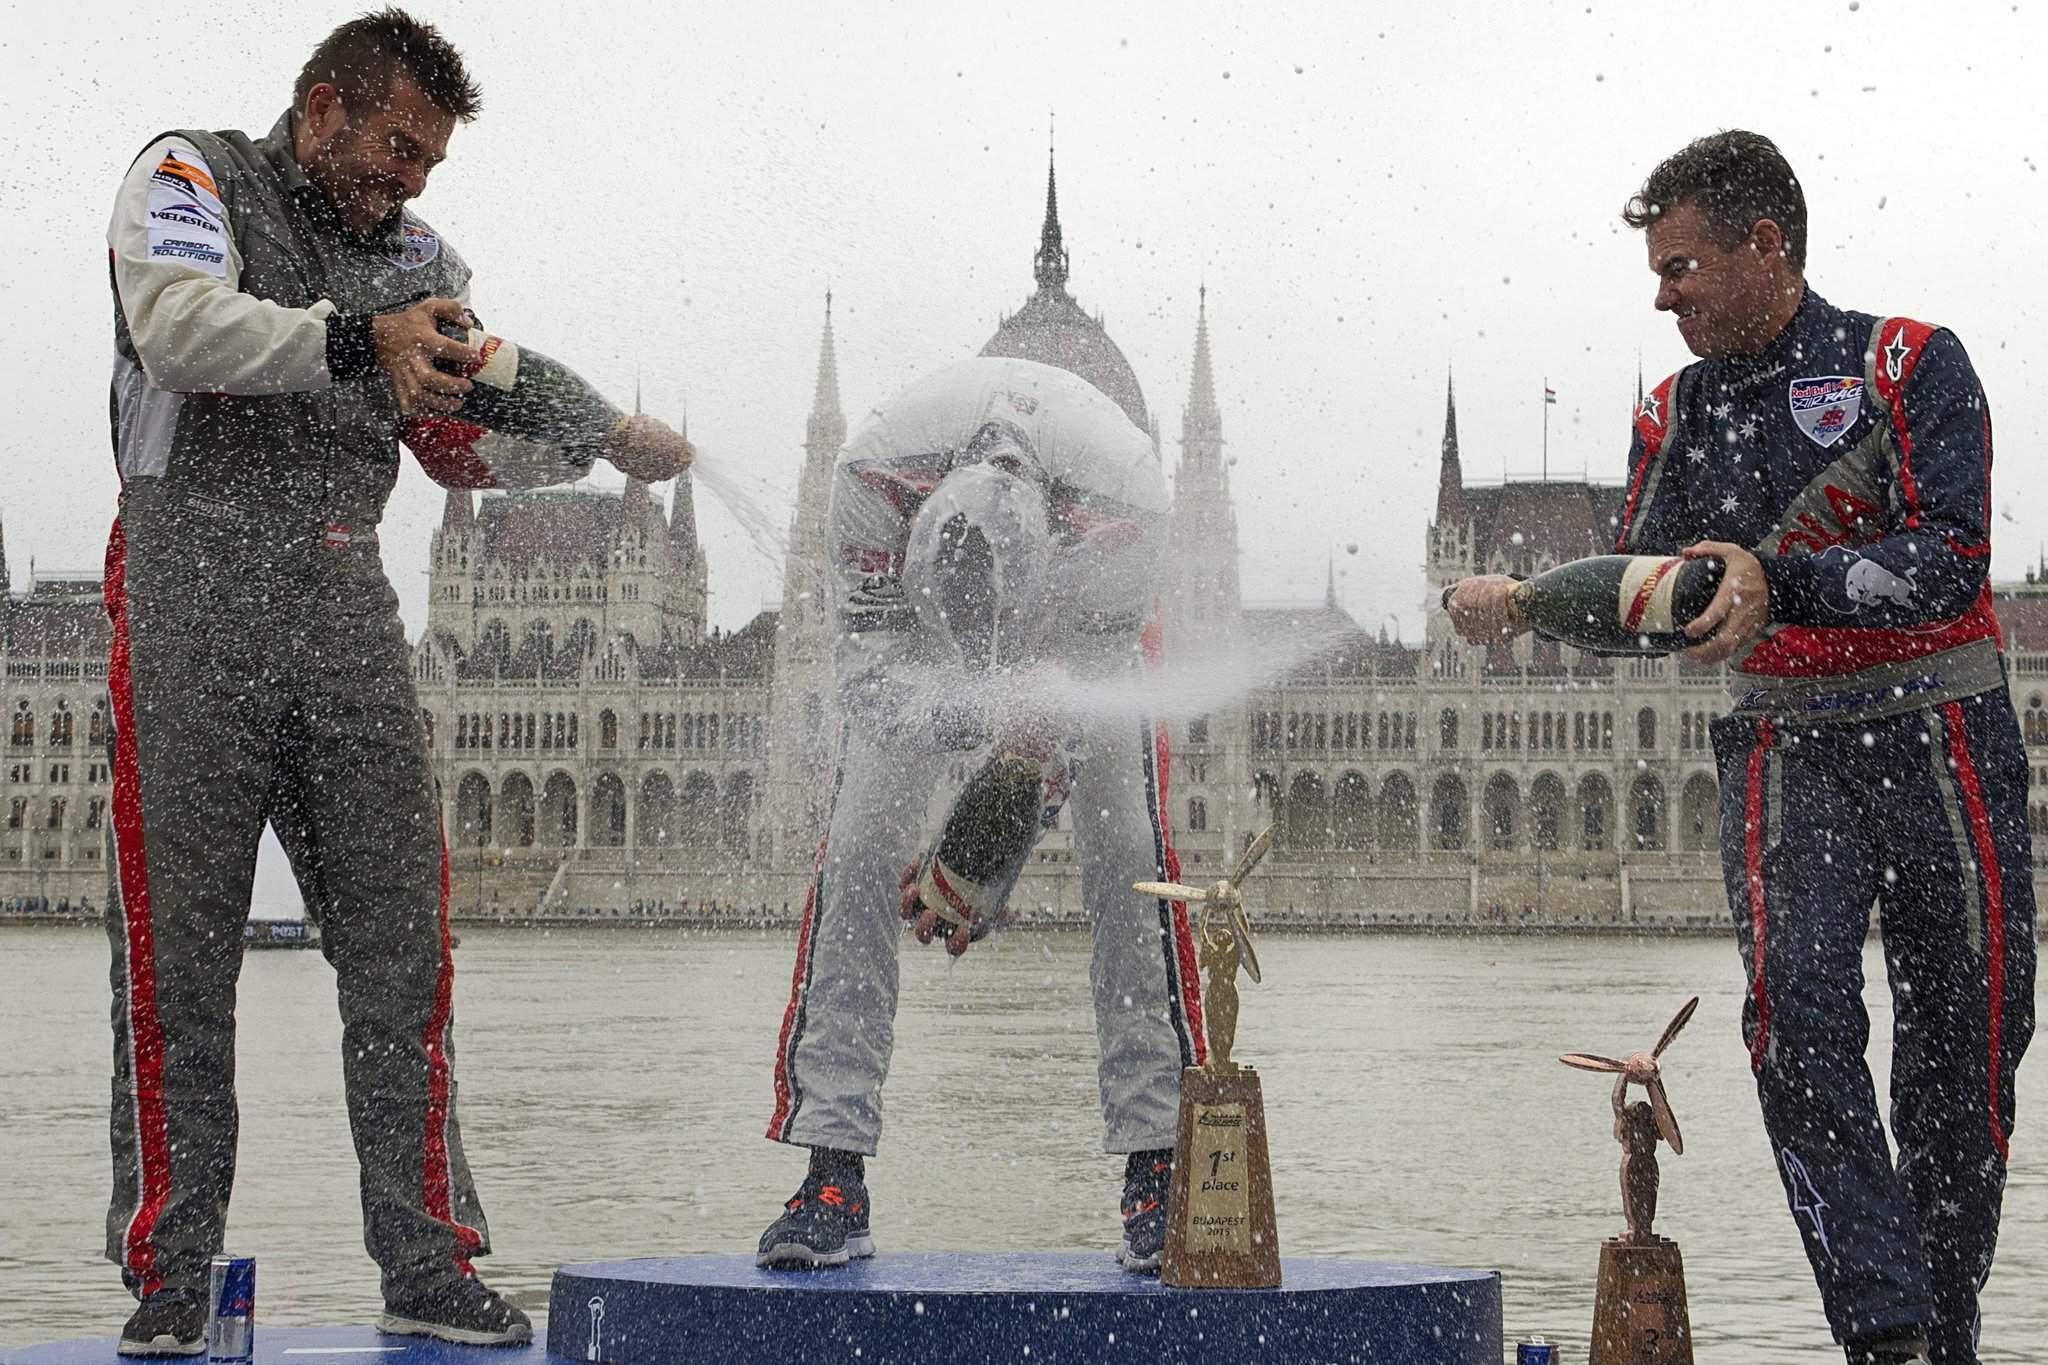 Red Bull Air Race: Matthias Dolderer wins in Budapest – Photo gallery